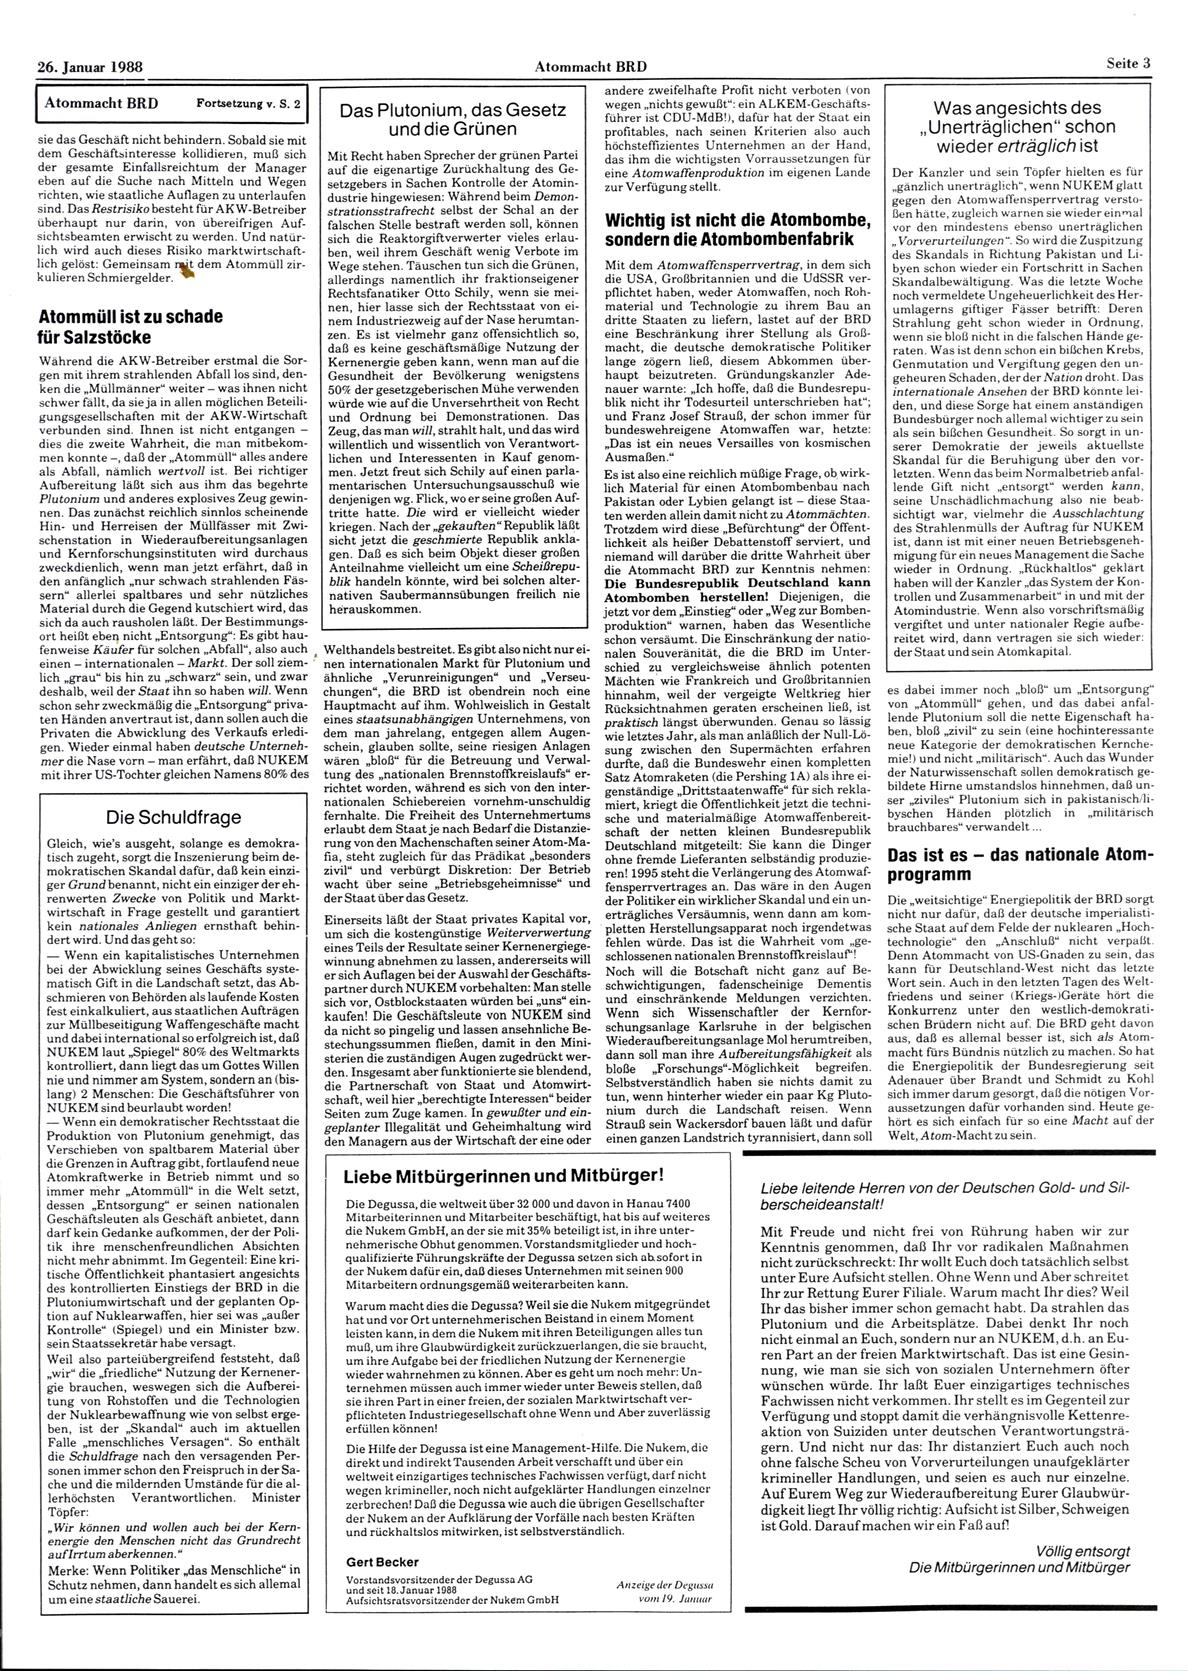 Bochum_BHZ_19880126_164_003